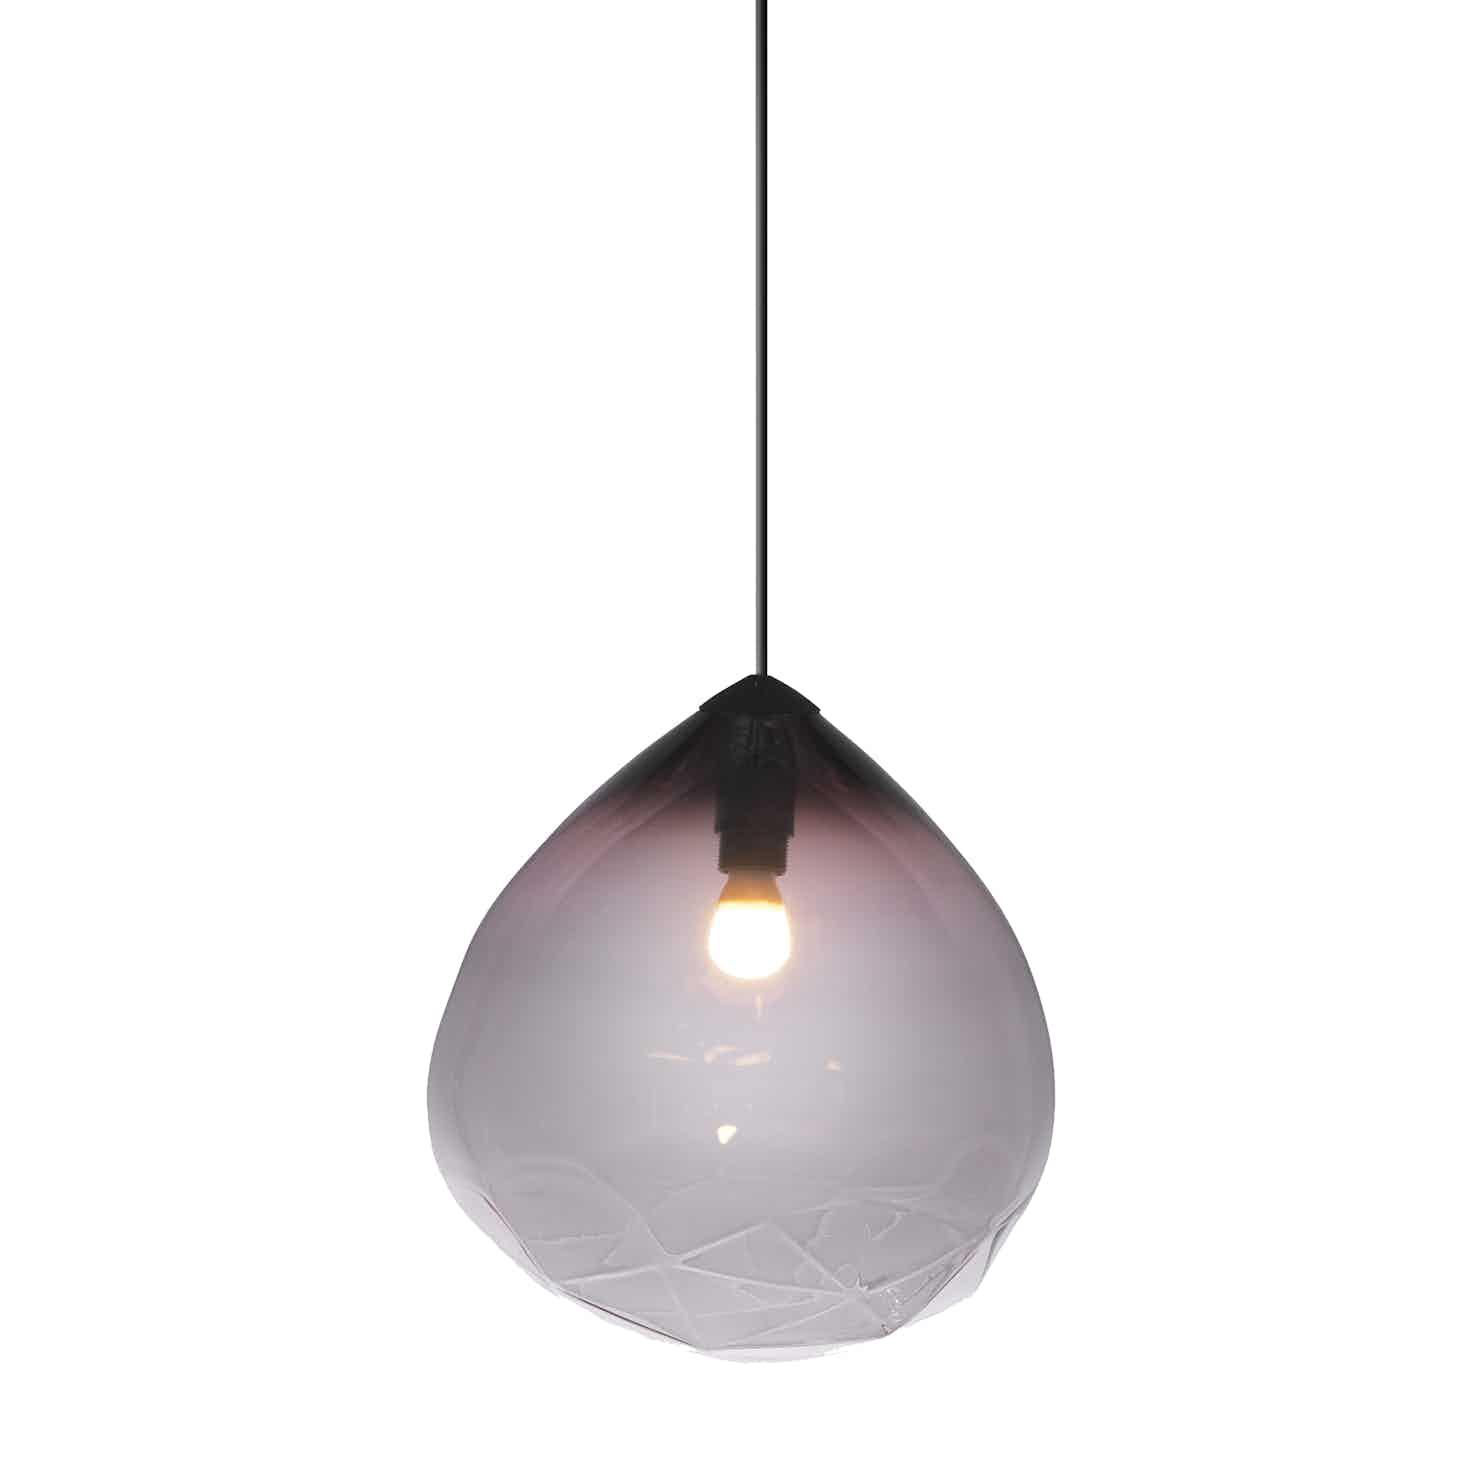 Resident-furniture-parison-pendant-dark-haute-living